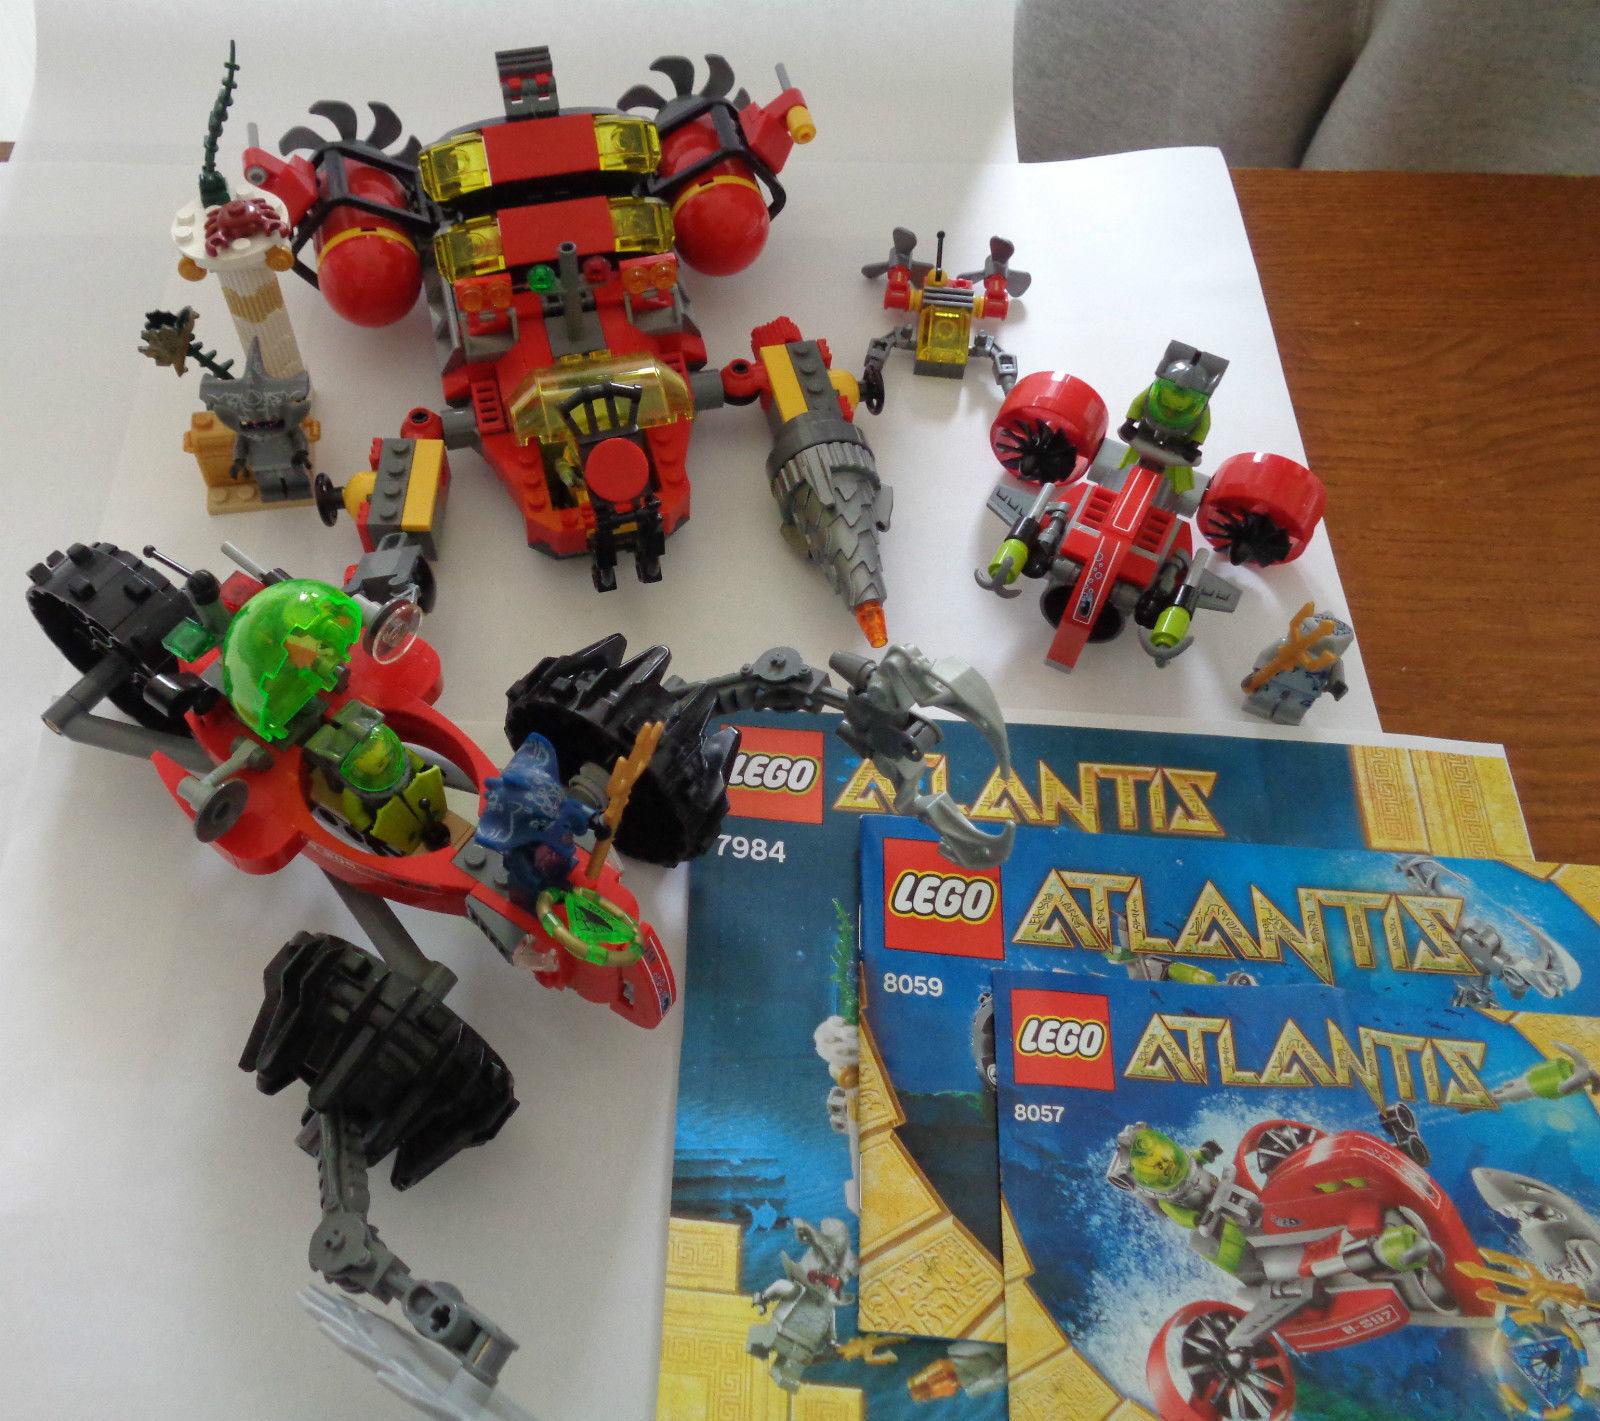 Lego 3x Atlantis 7984 8057 8059